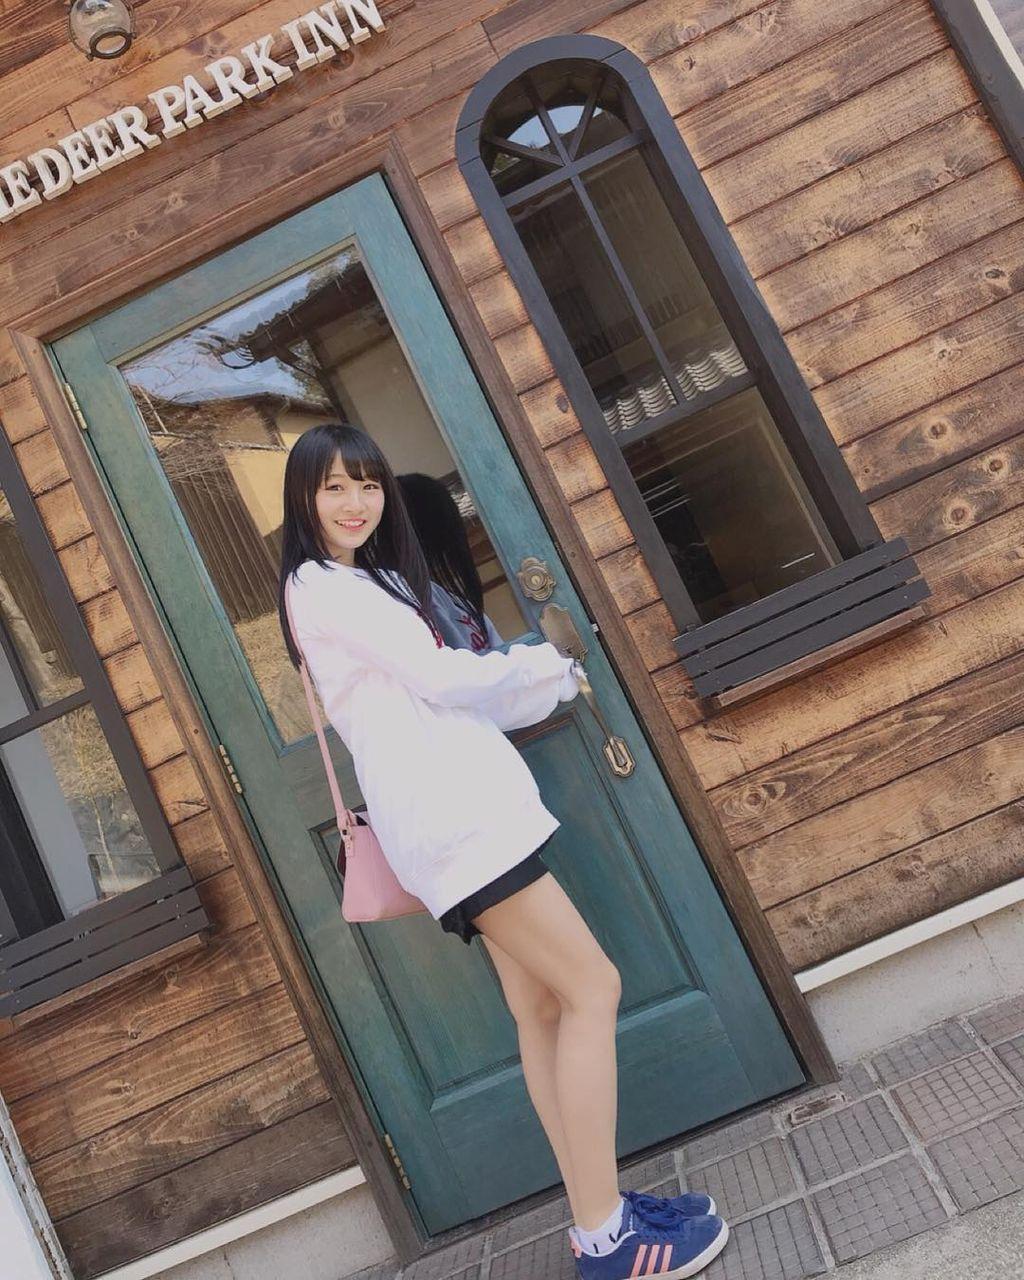 【NMB48】山本彩加がtwitterとインスタ開始キタ━━━━(゚∀゚)━━━━!!